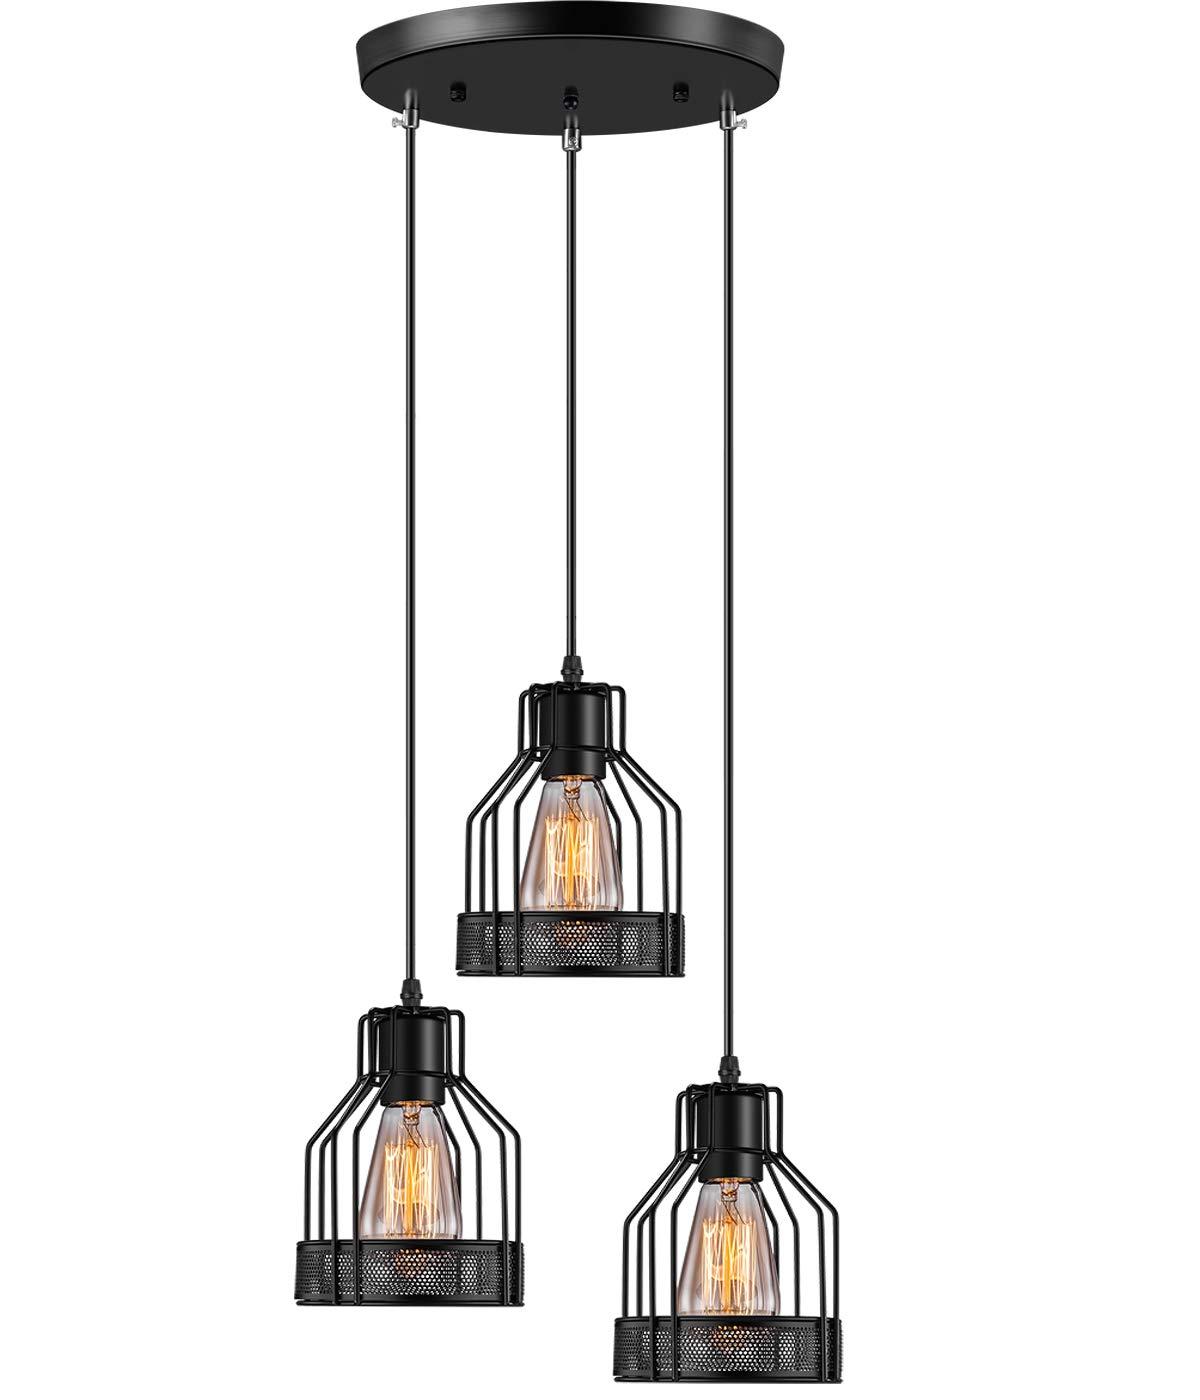 Industrial Pendant Lighting Licperron E26 Base Edison Metal Caged Vintage Hanging Pendant 3-Lights Rustic Pendant Light Fixture for Kitchen Dining Room Bar Hotel